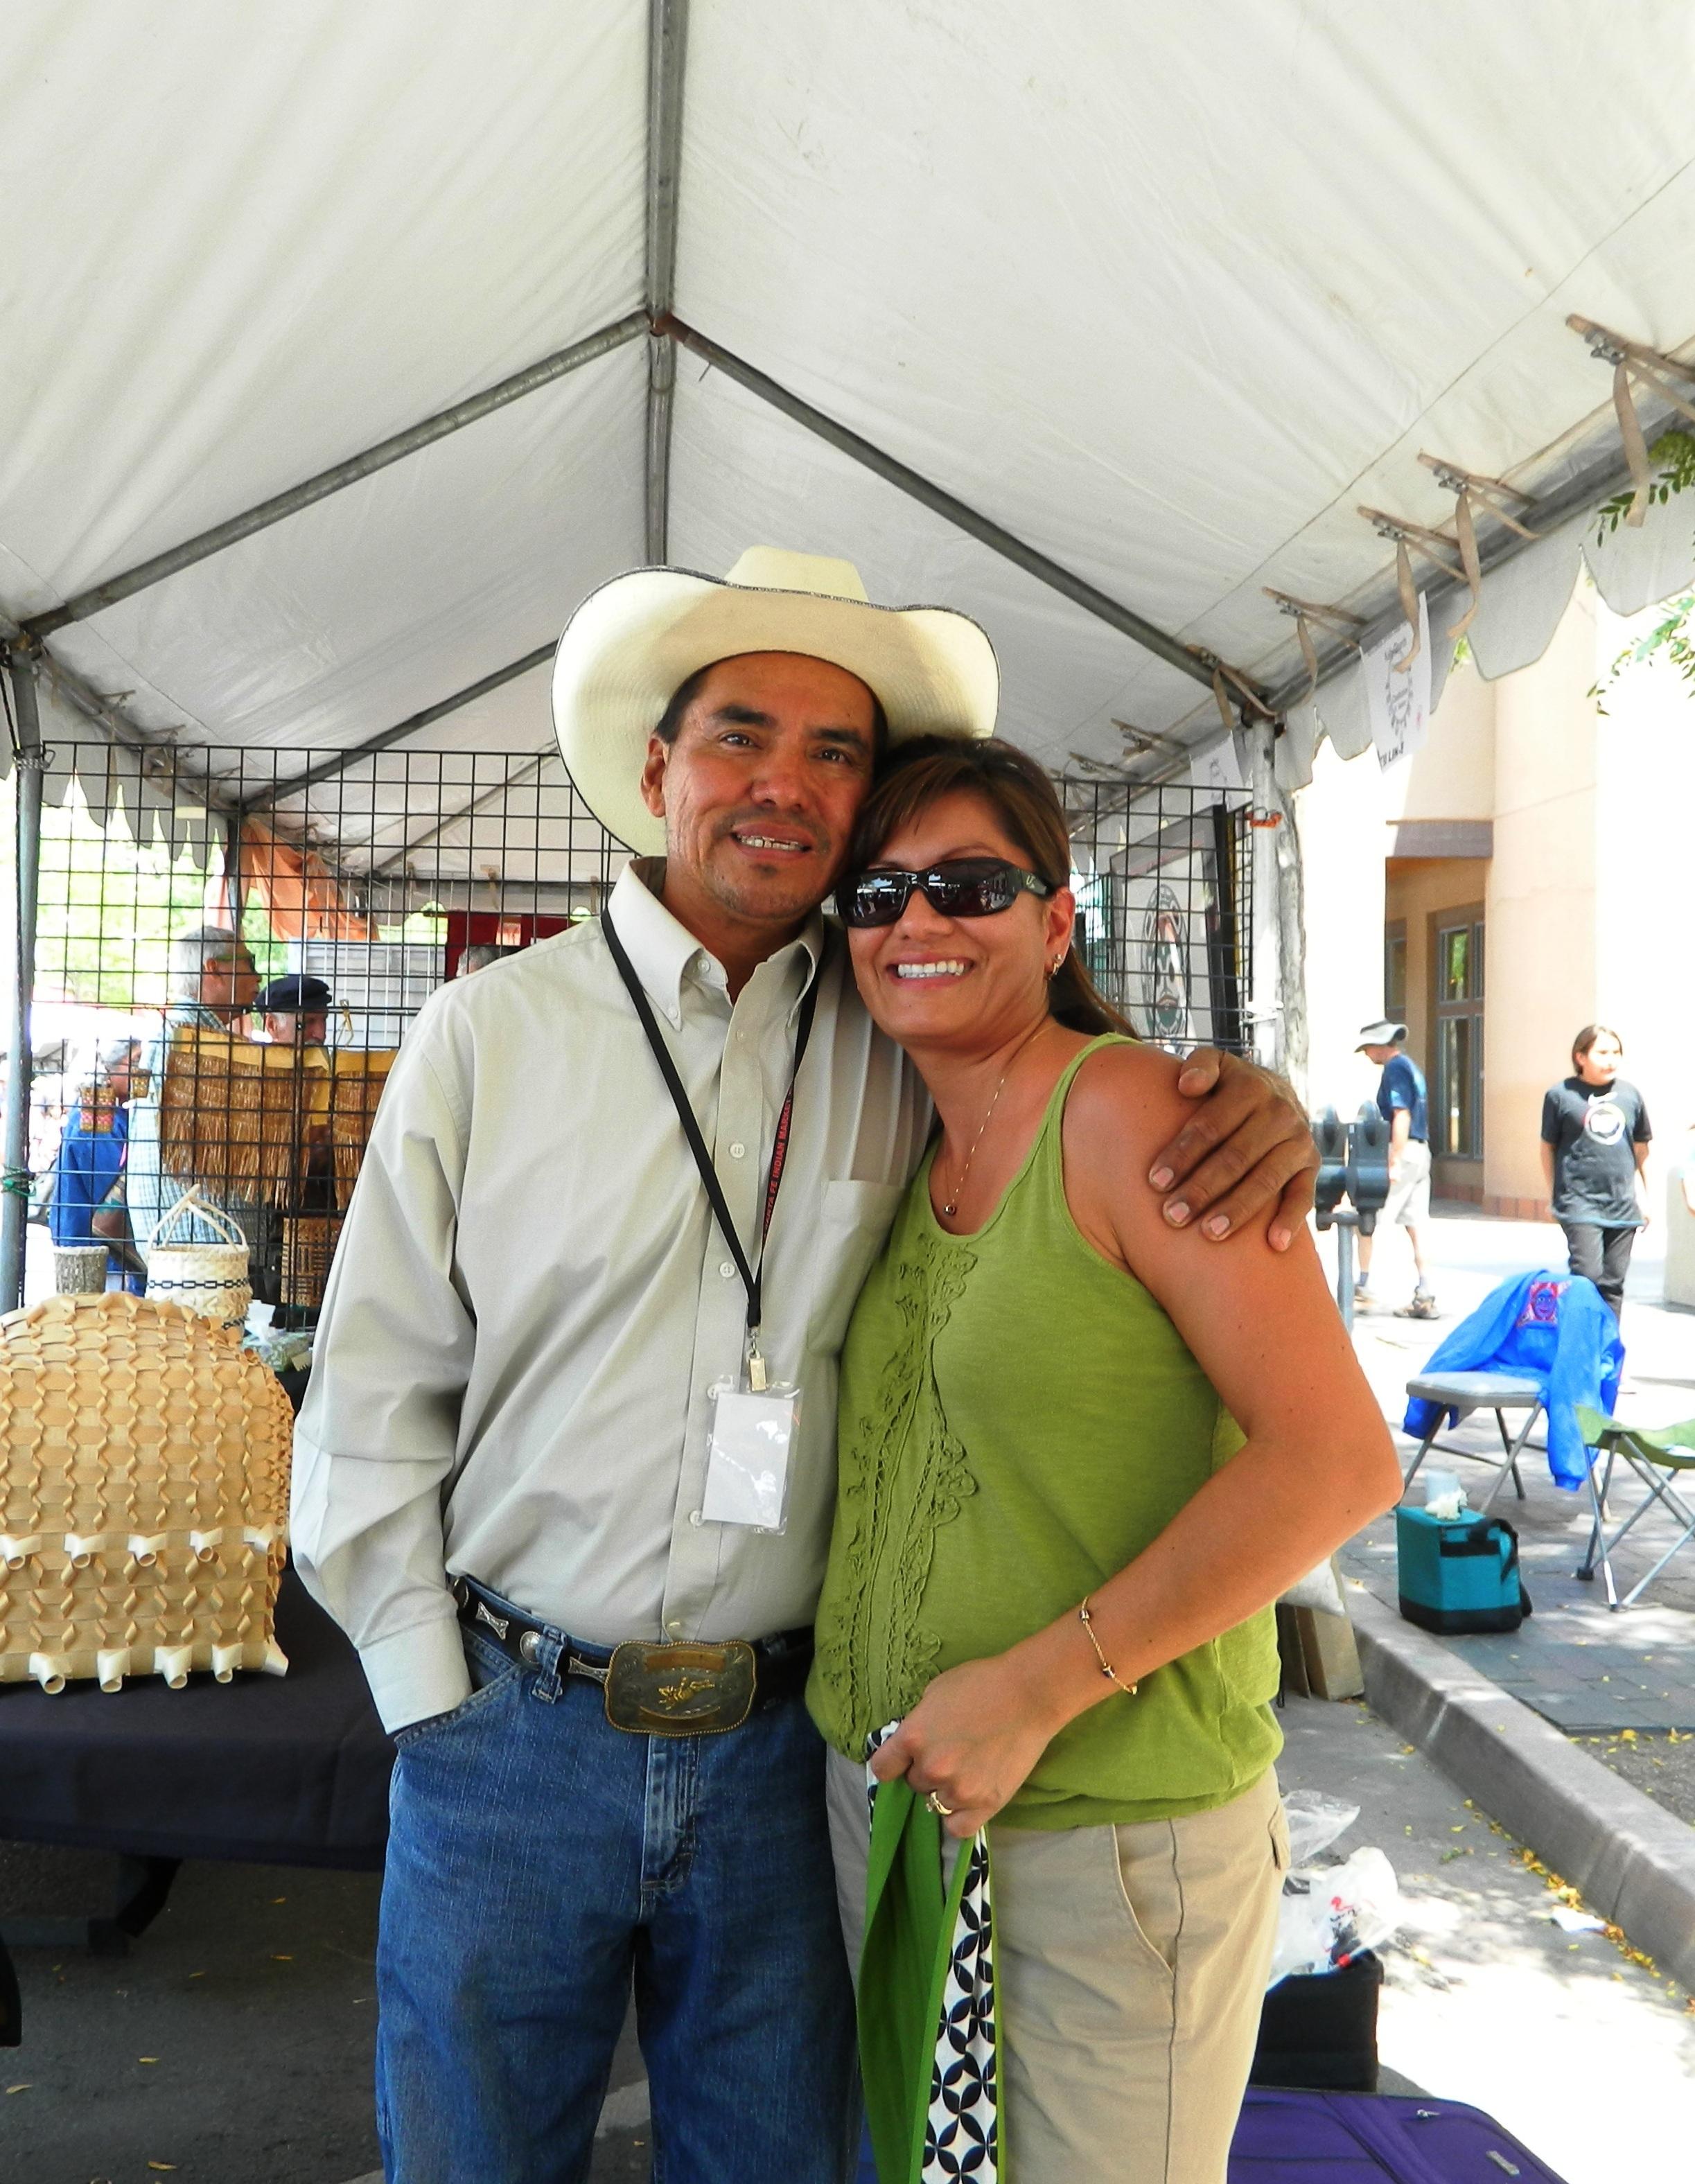 Ira & his sister, Mechel at SWAIA circa 2014